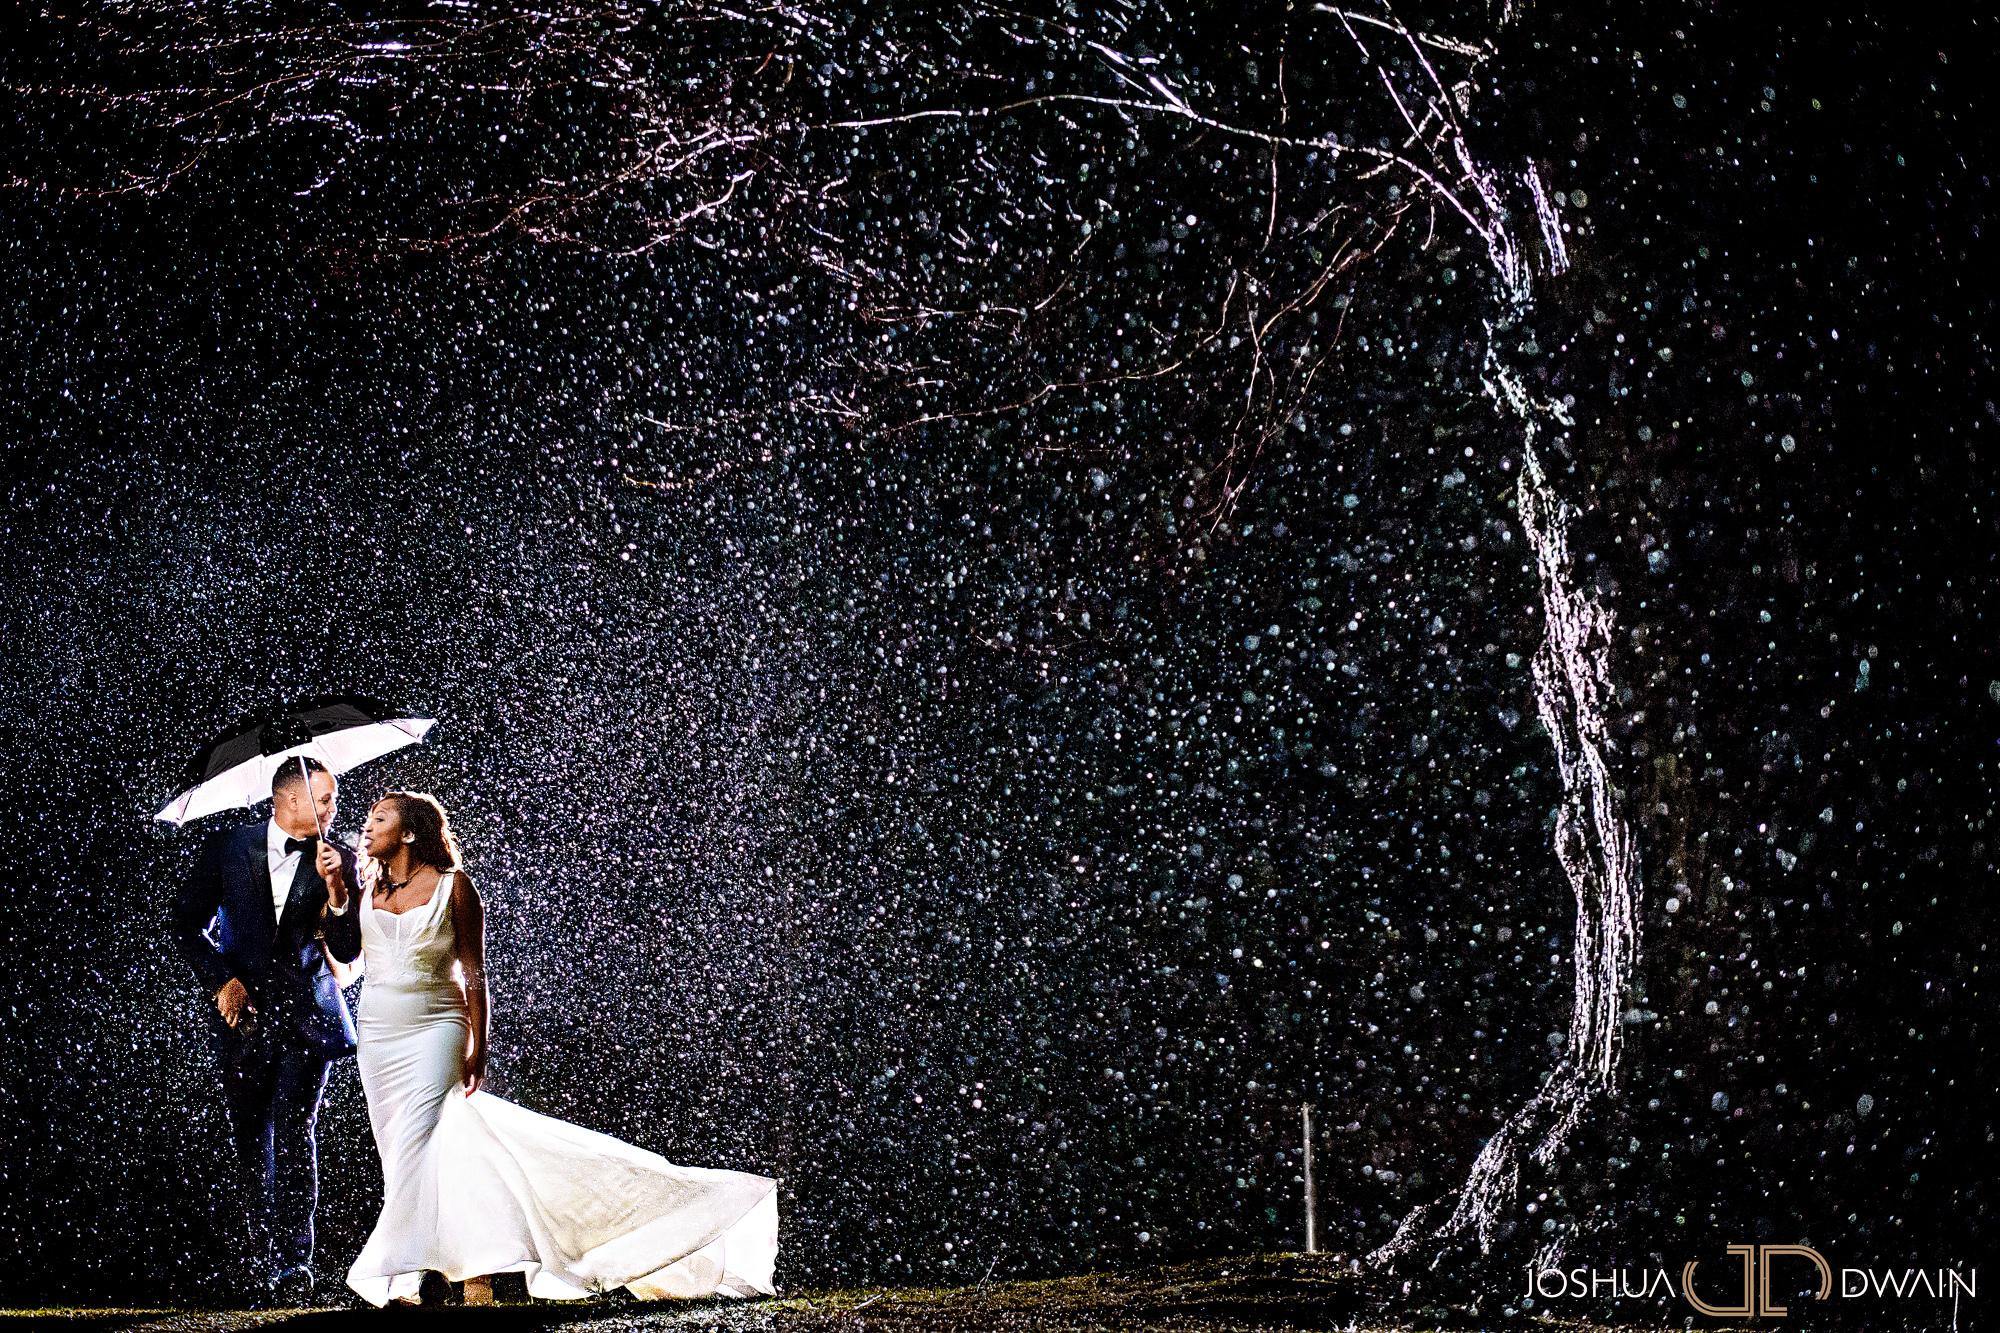 joshua-dwain-weddings-gallery-best-wedding-photographers-us-048